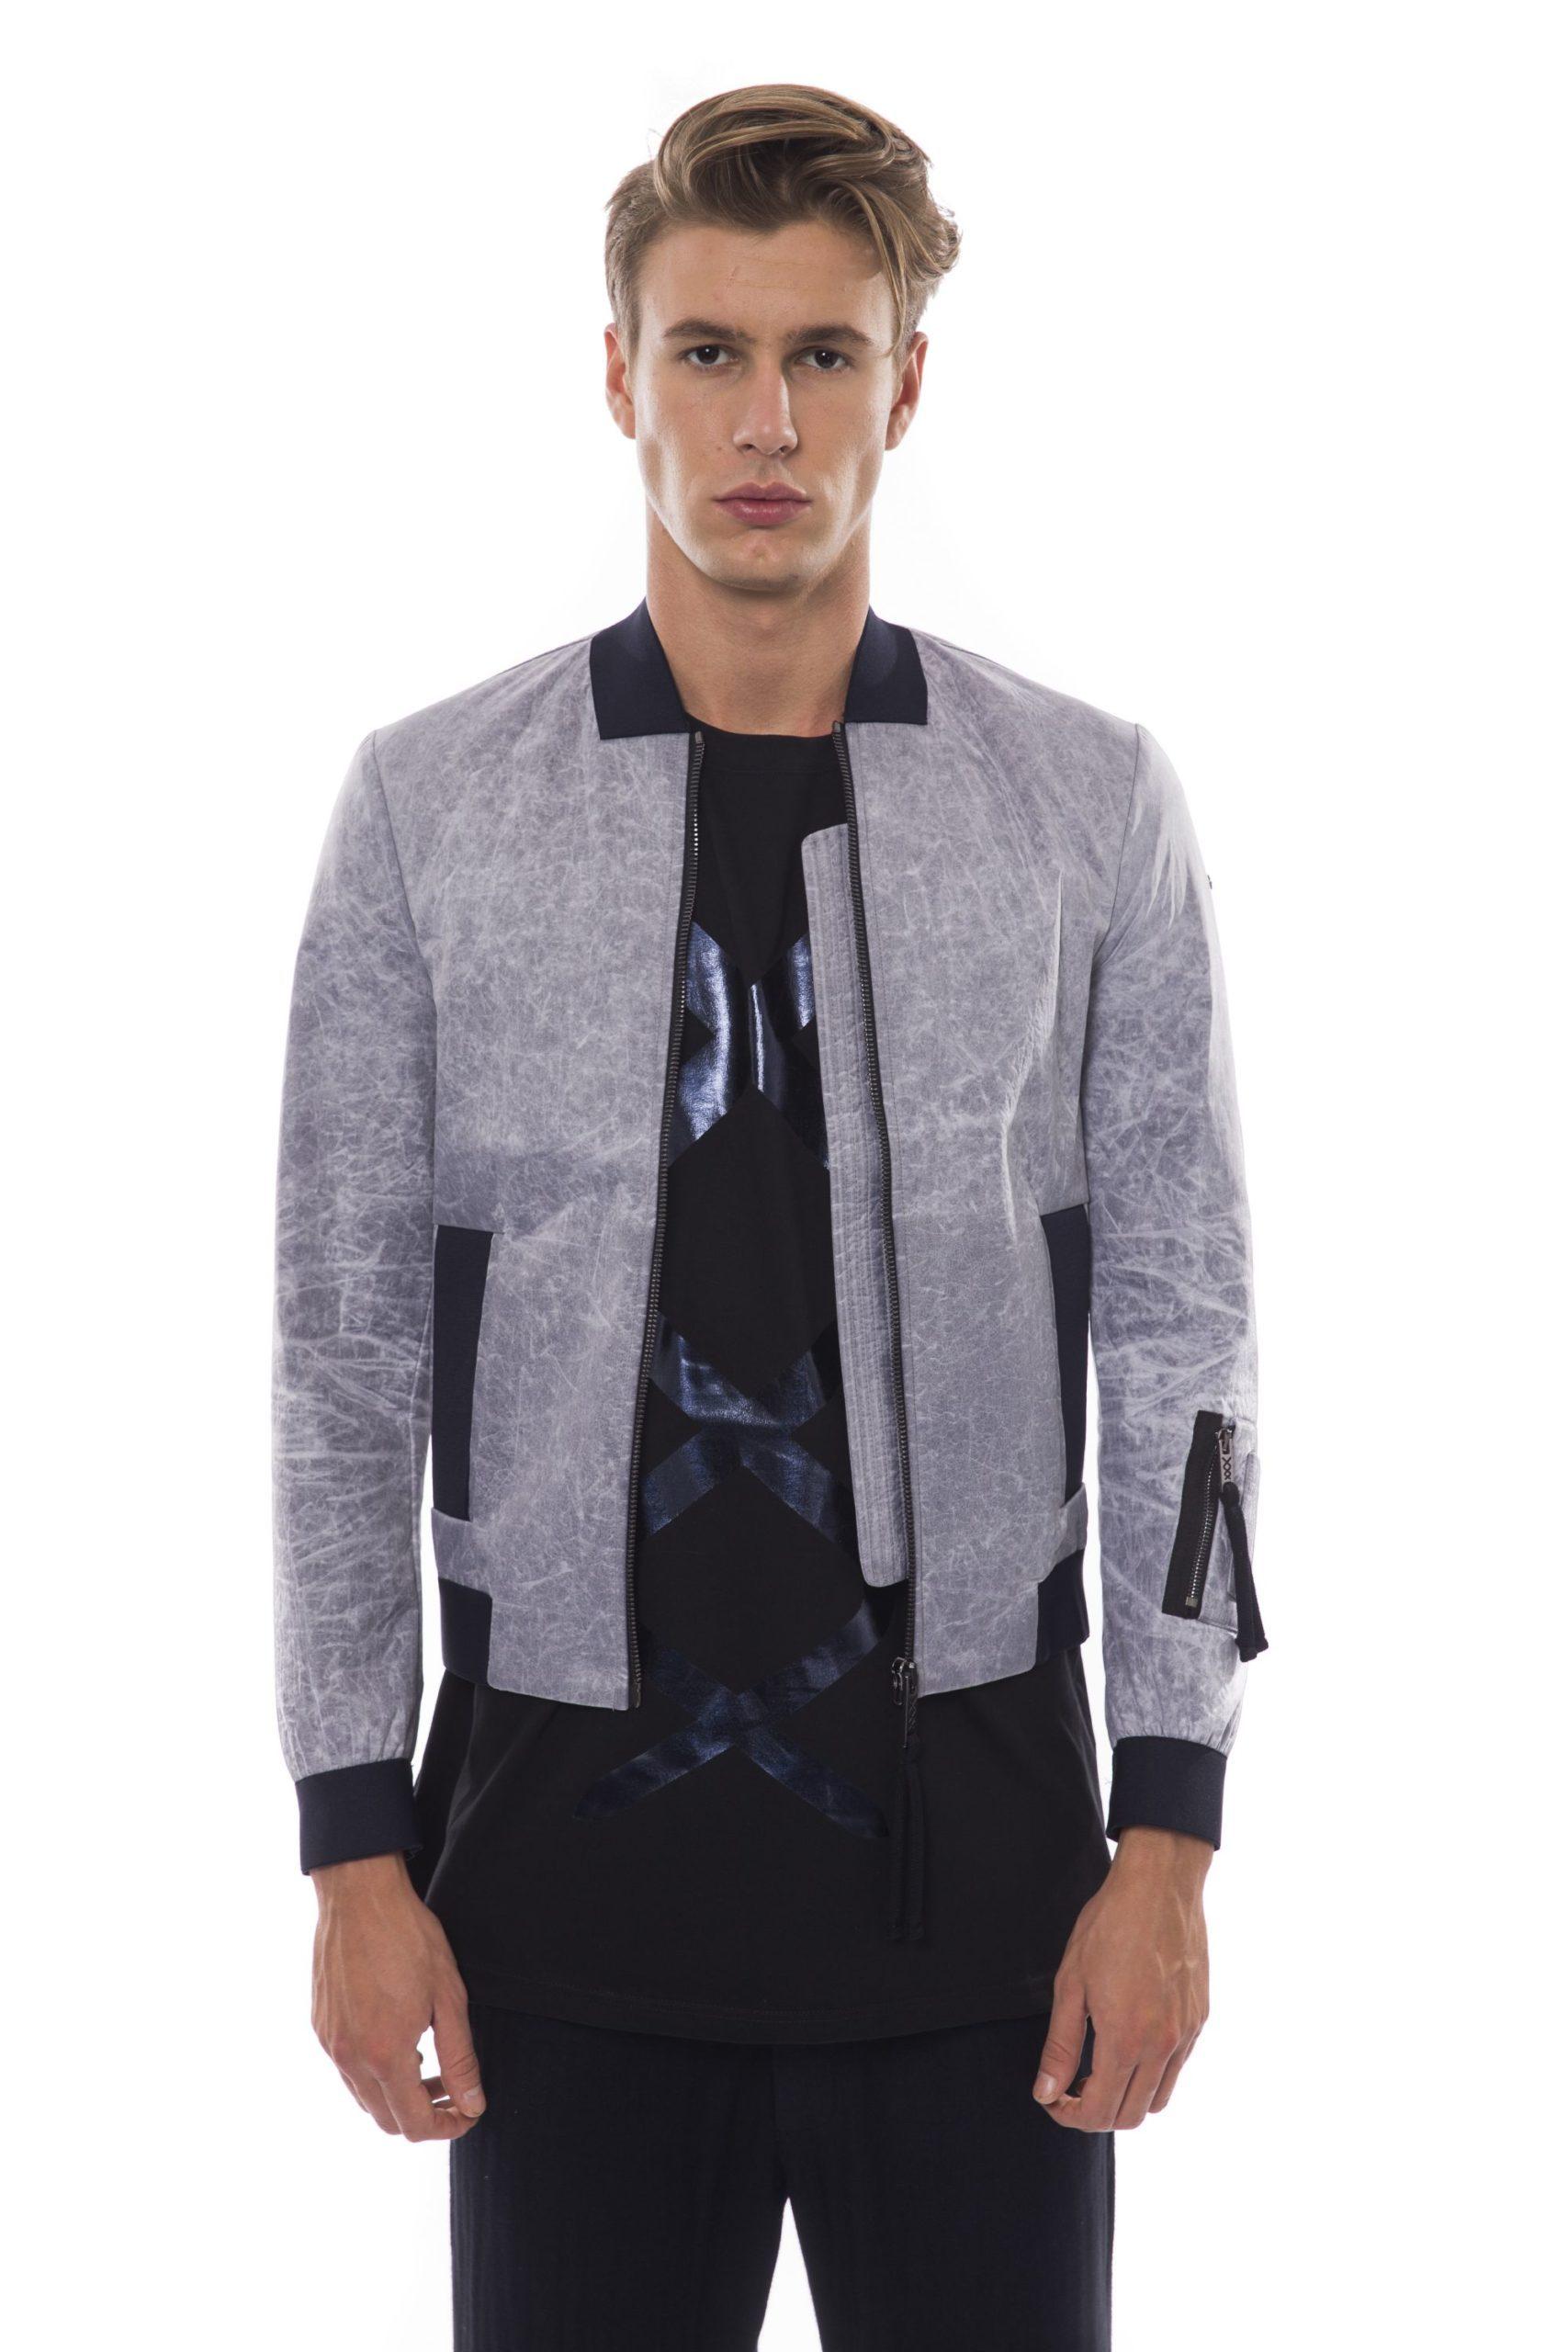 Nicolo Tonetto Men's Ghiaccio Ice Jacket Gray NI1281087 - XS